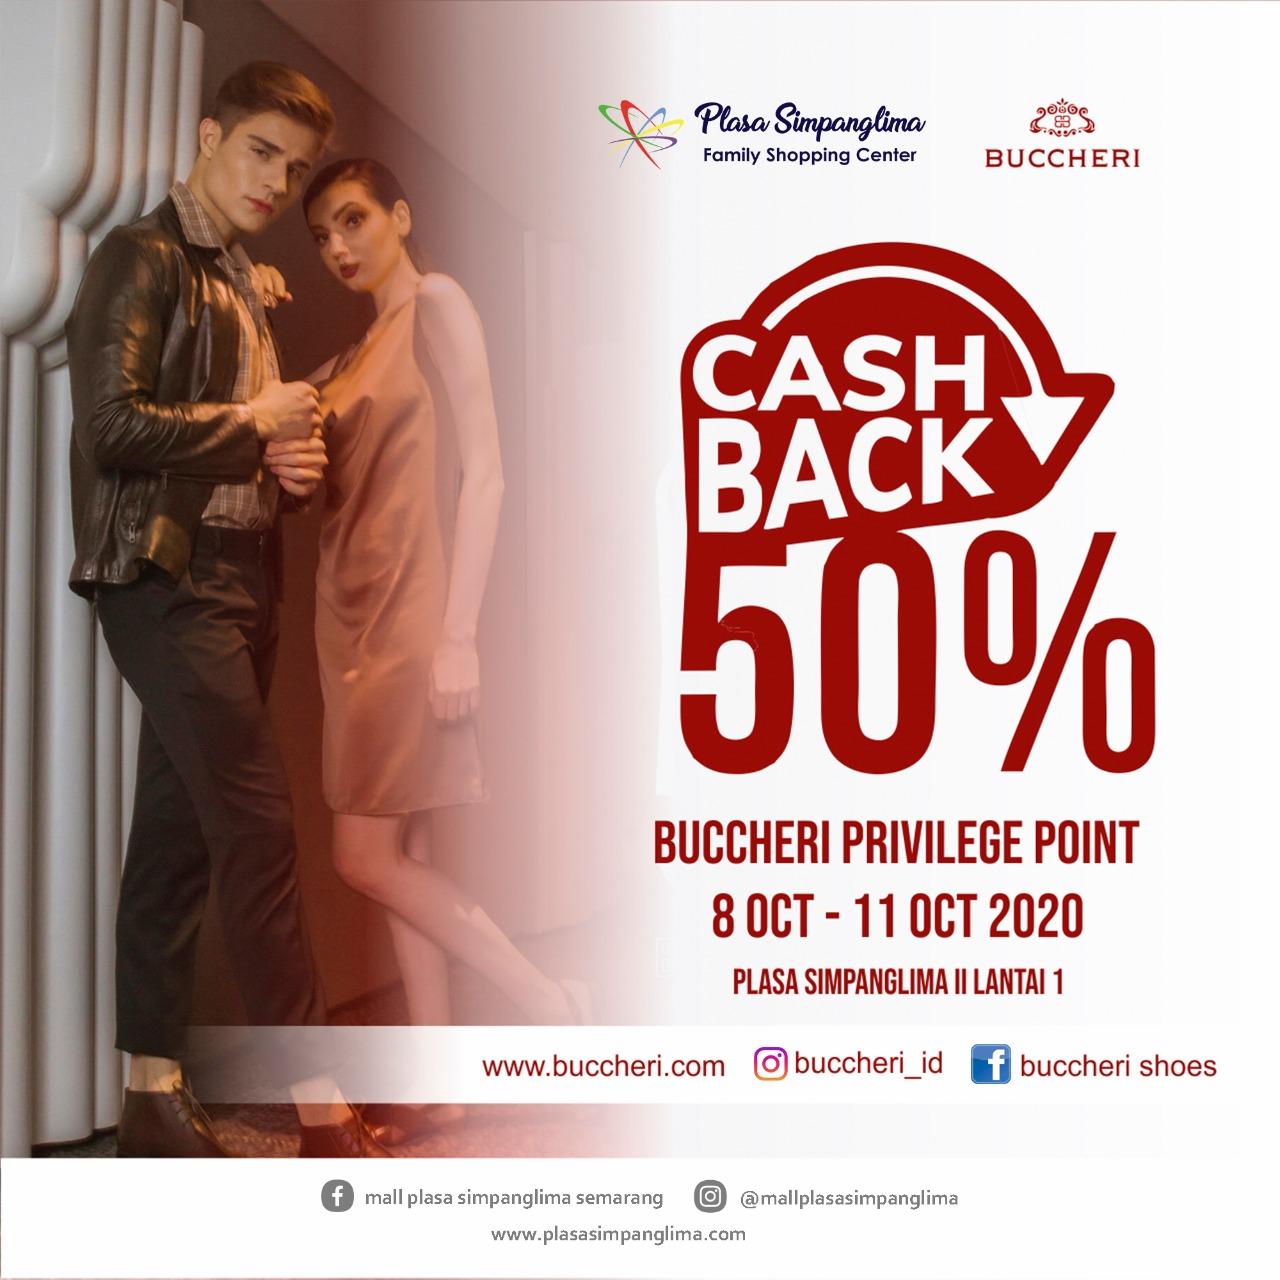 BUCCHERI CASHBACK 50%